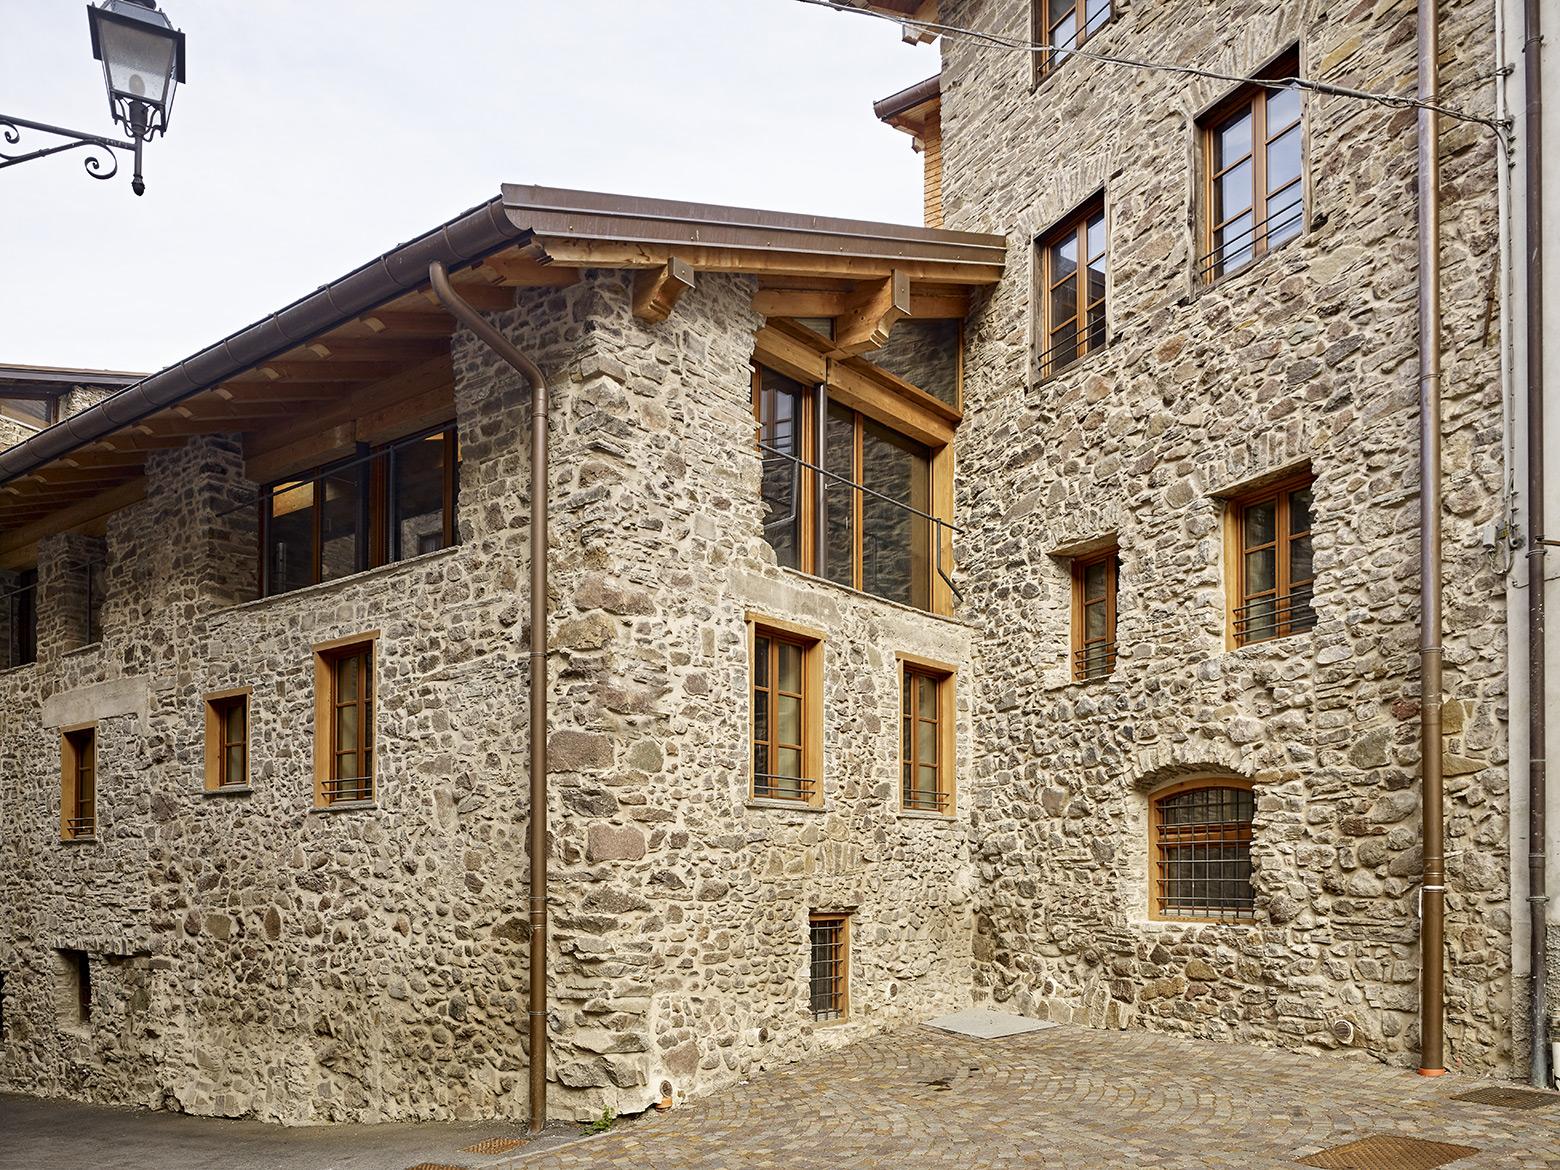 Hotel Borgo Antico – IDEA 85